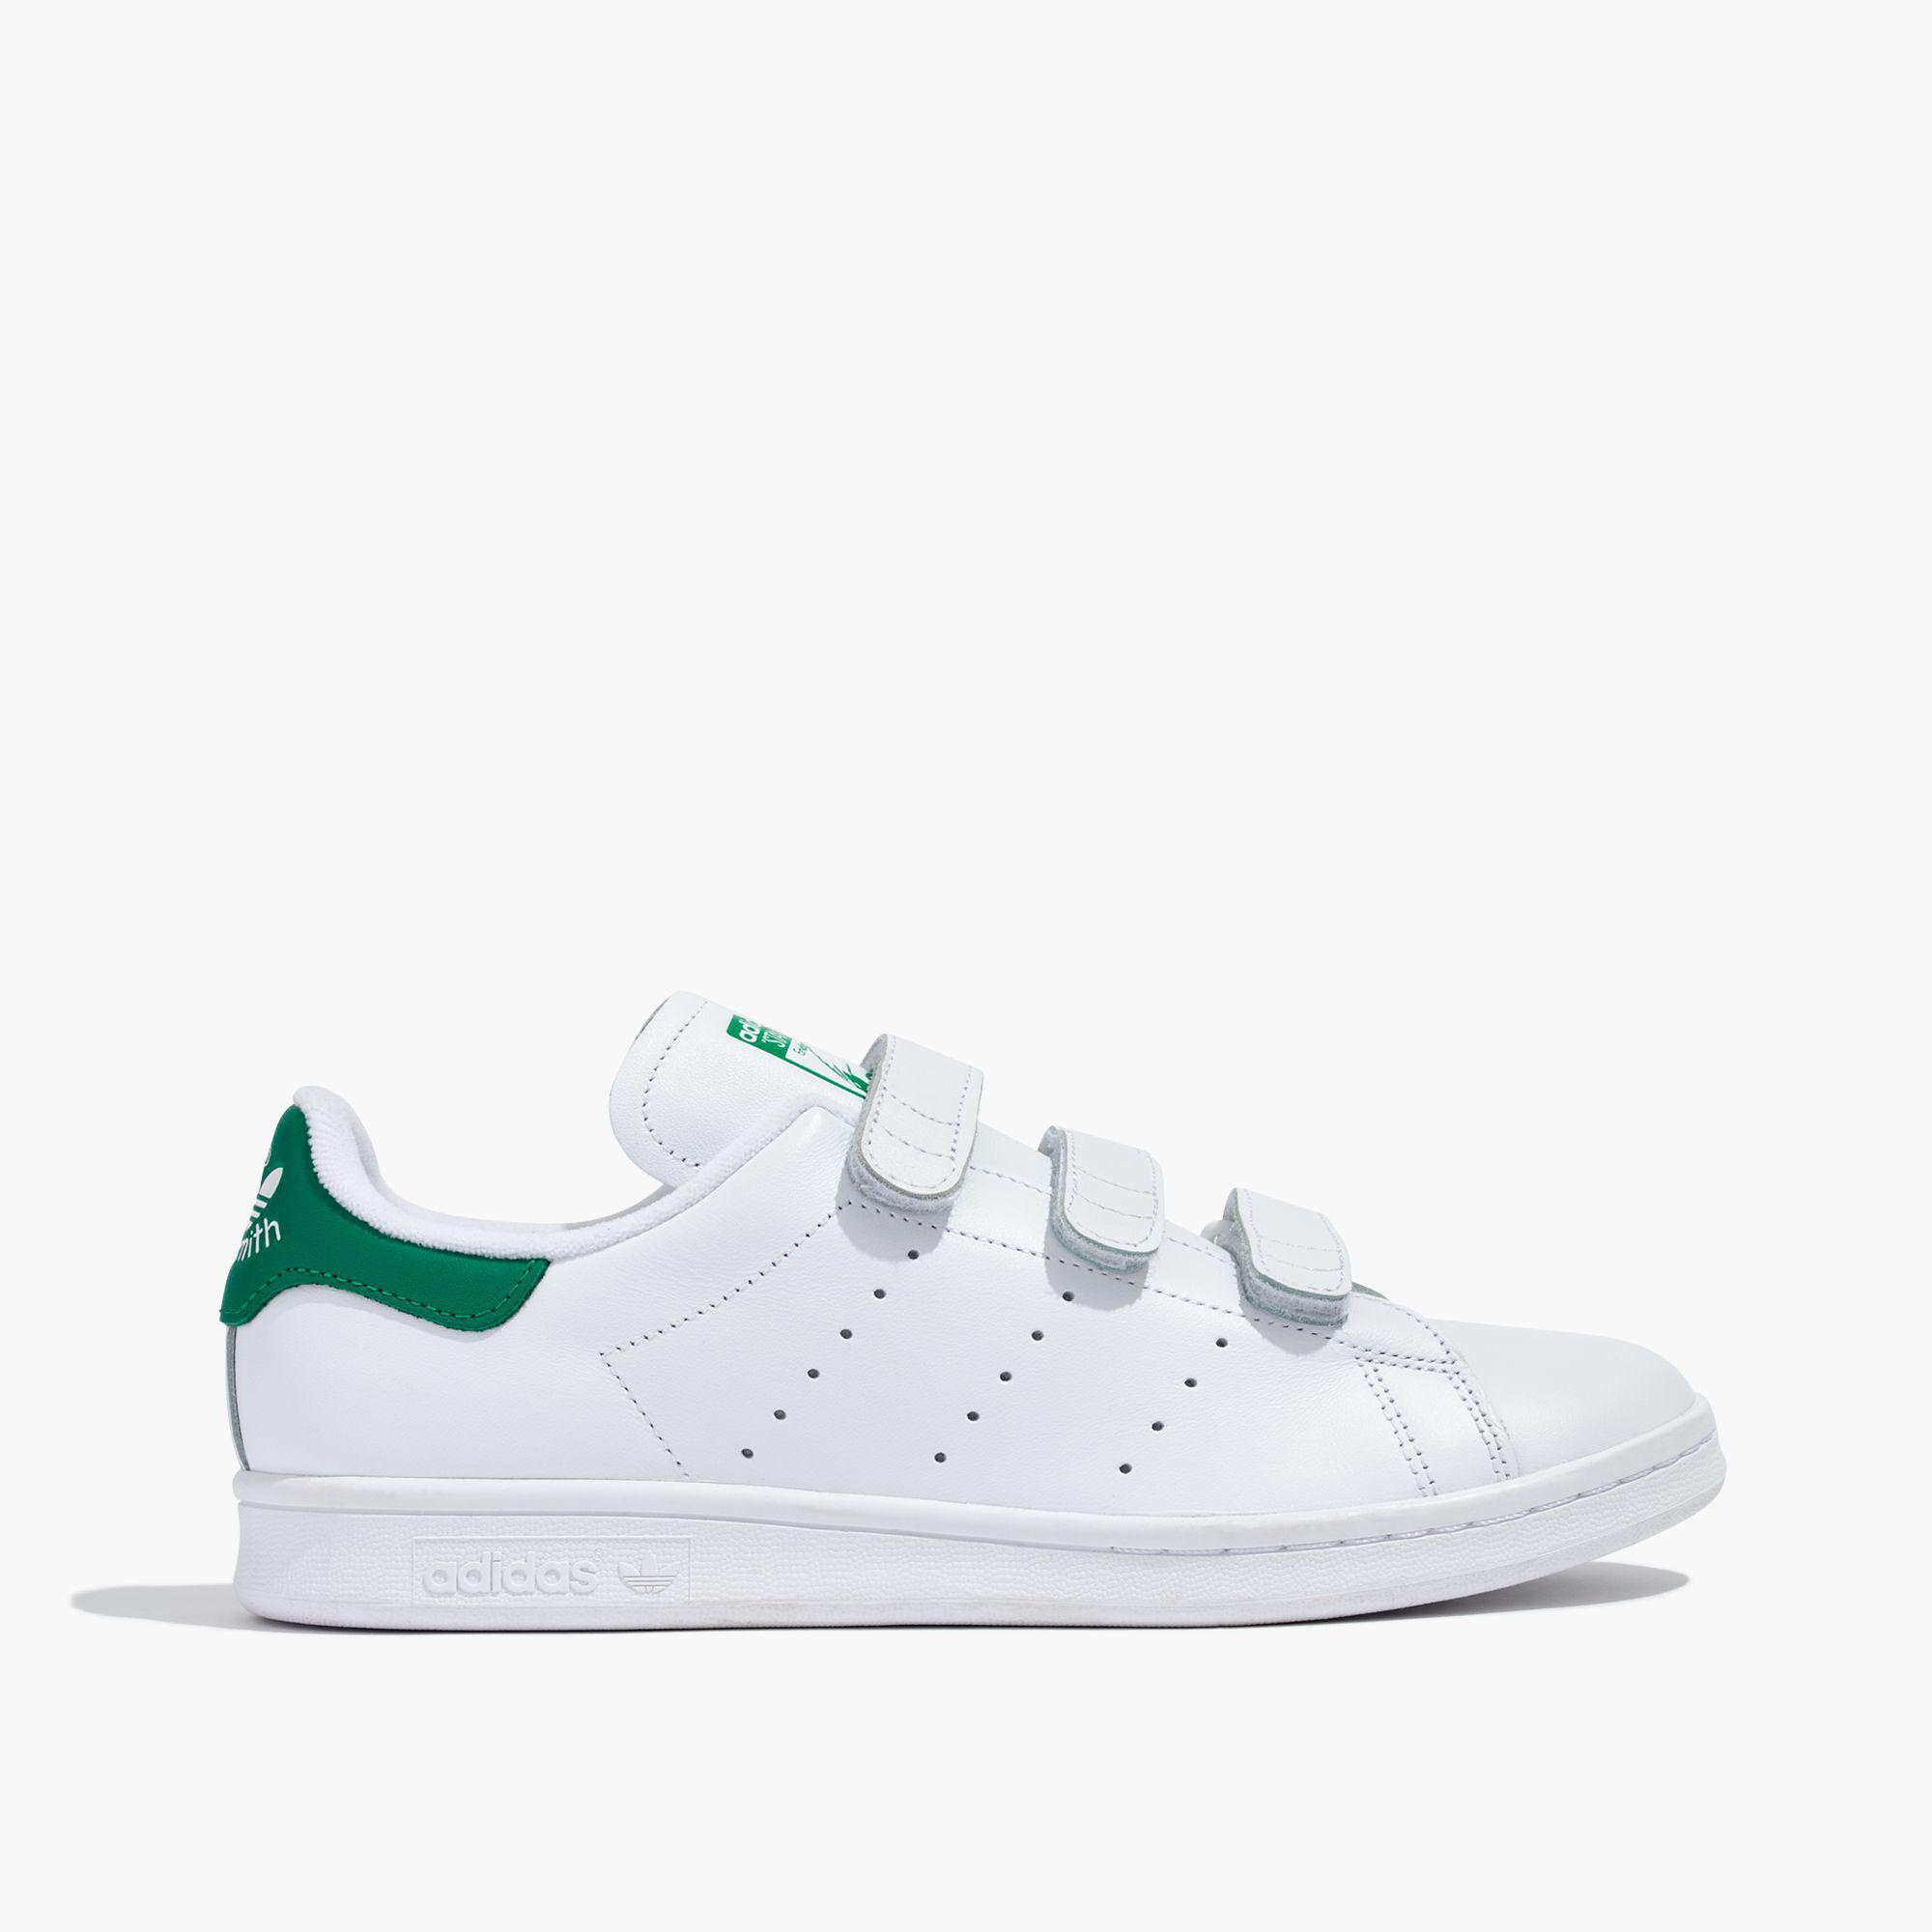 Mason S Men Velcro Shoes